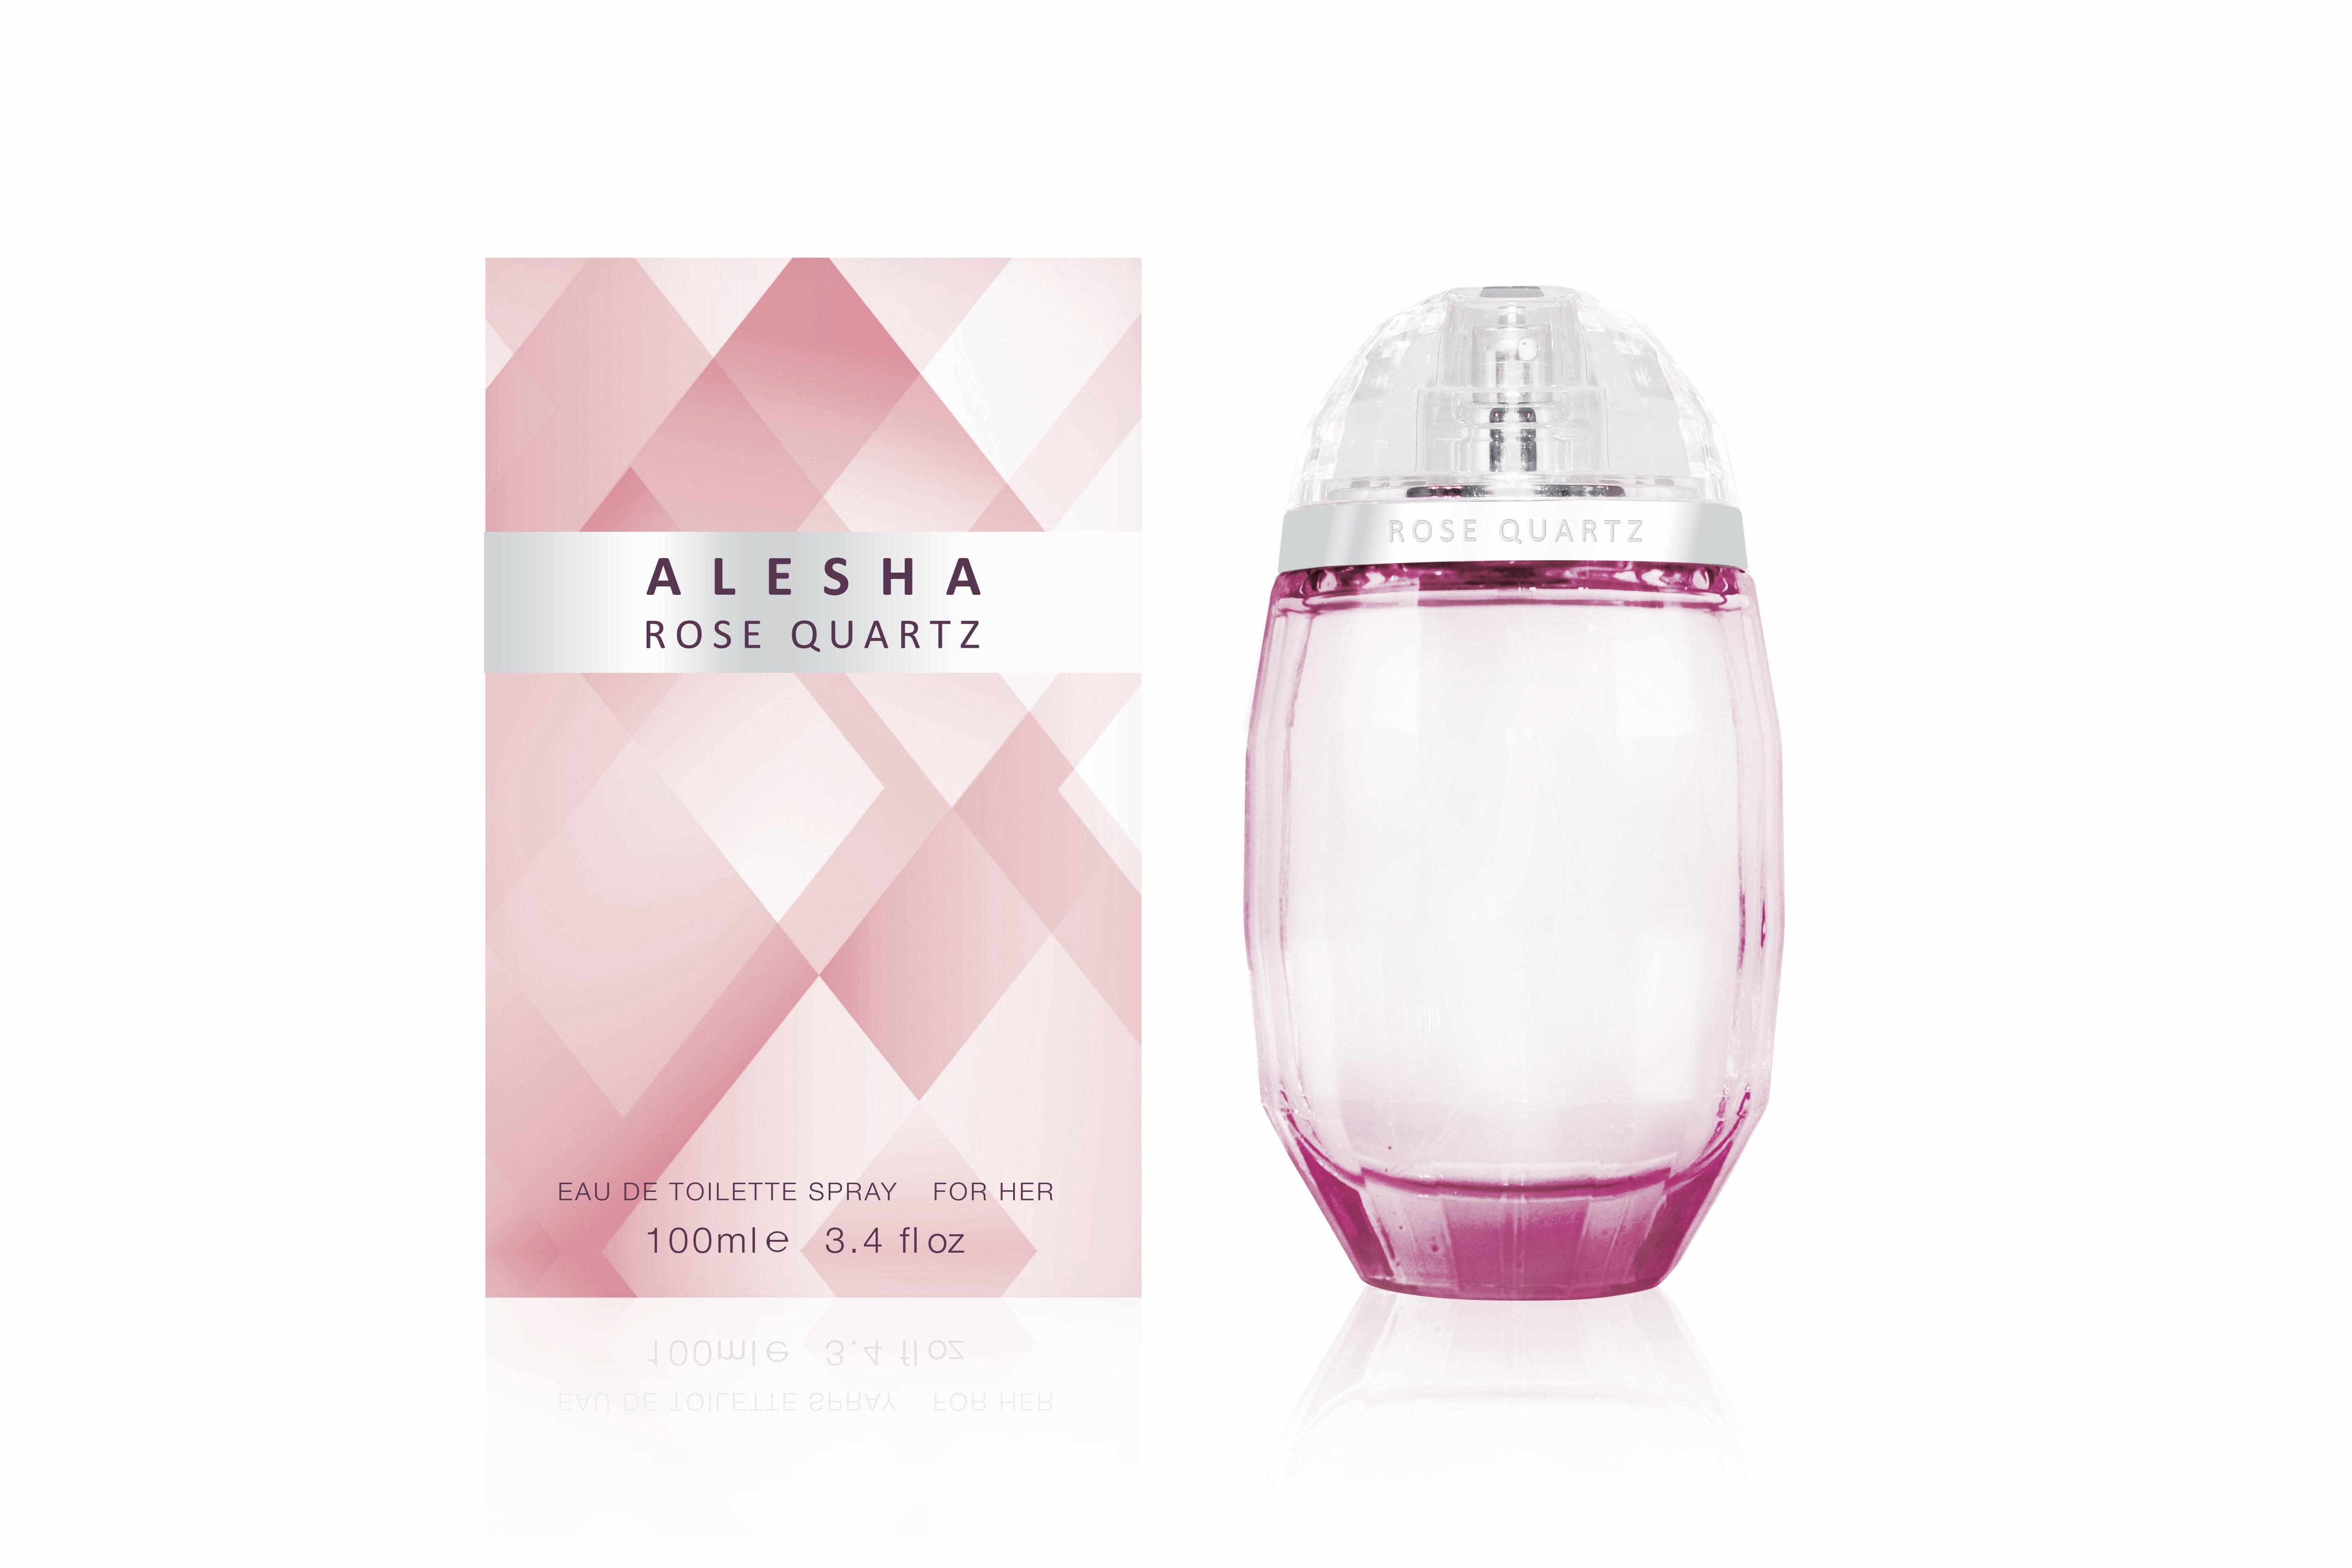 Alesha rose quartz with box 100ml 24 50 credit as nationwide stockists